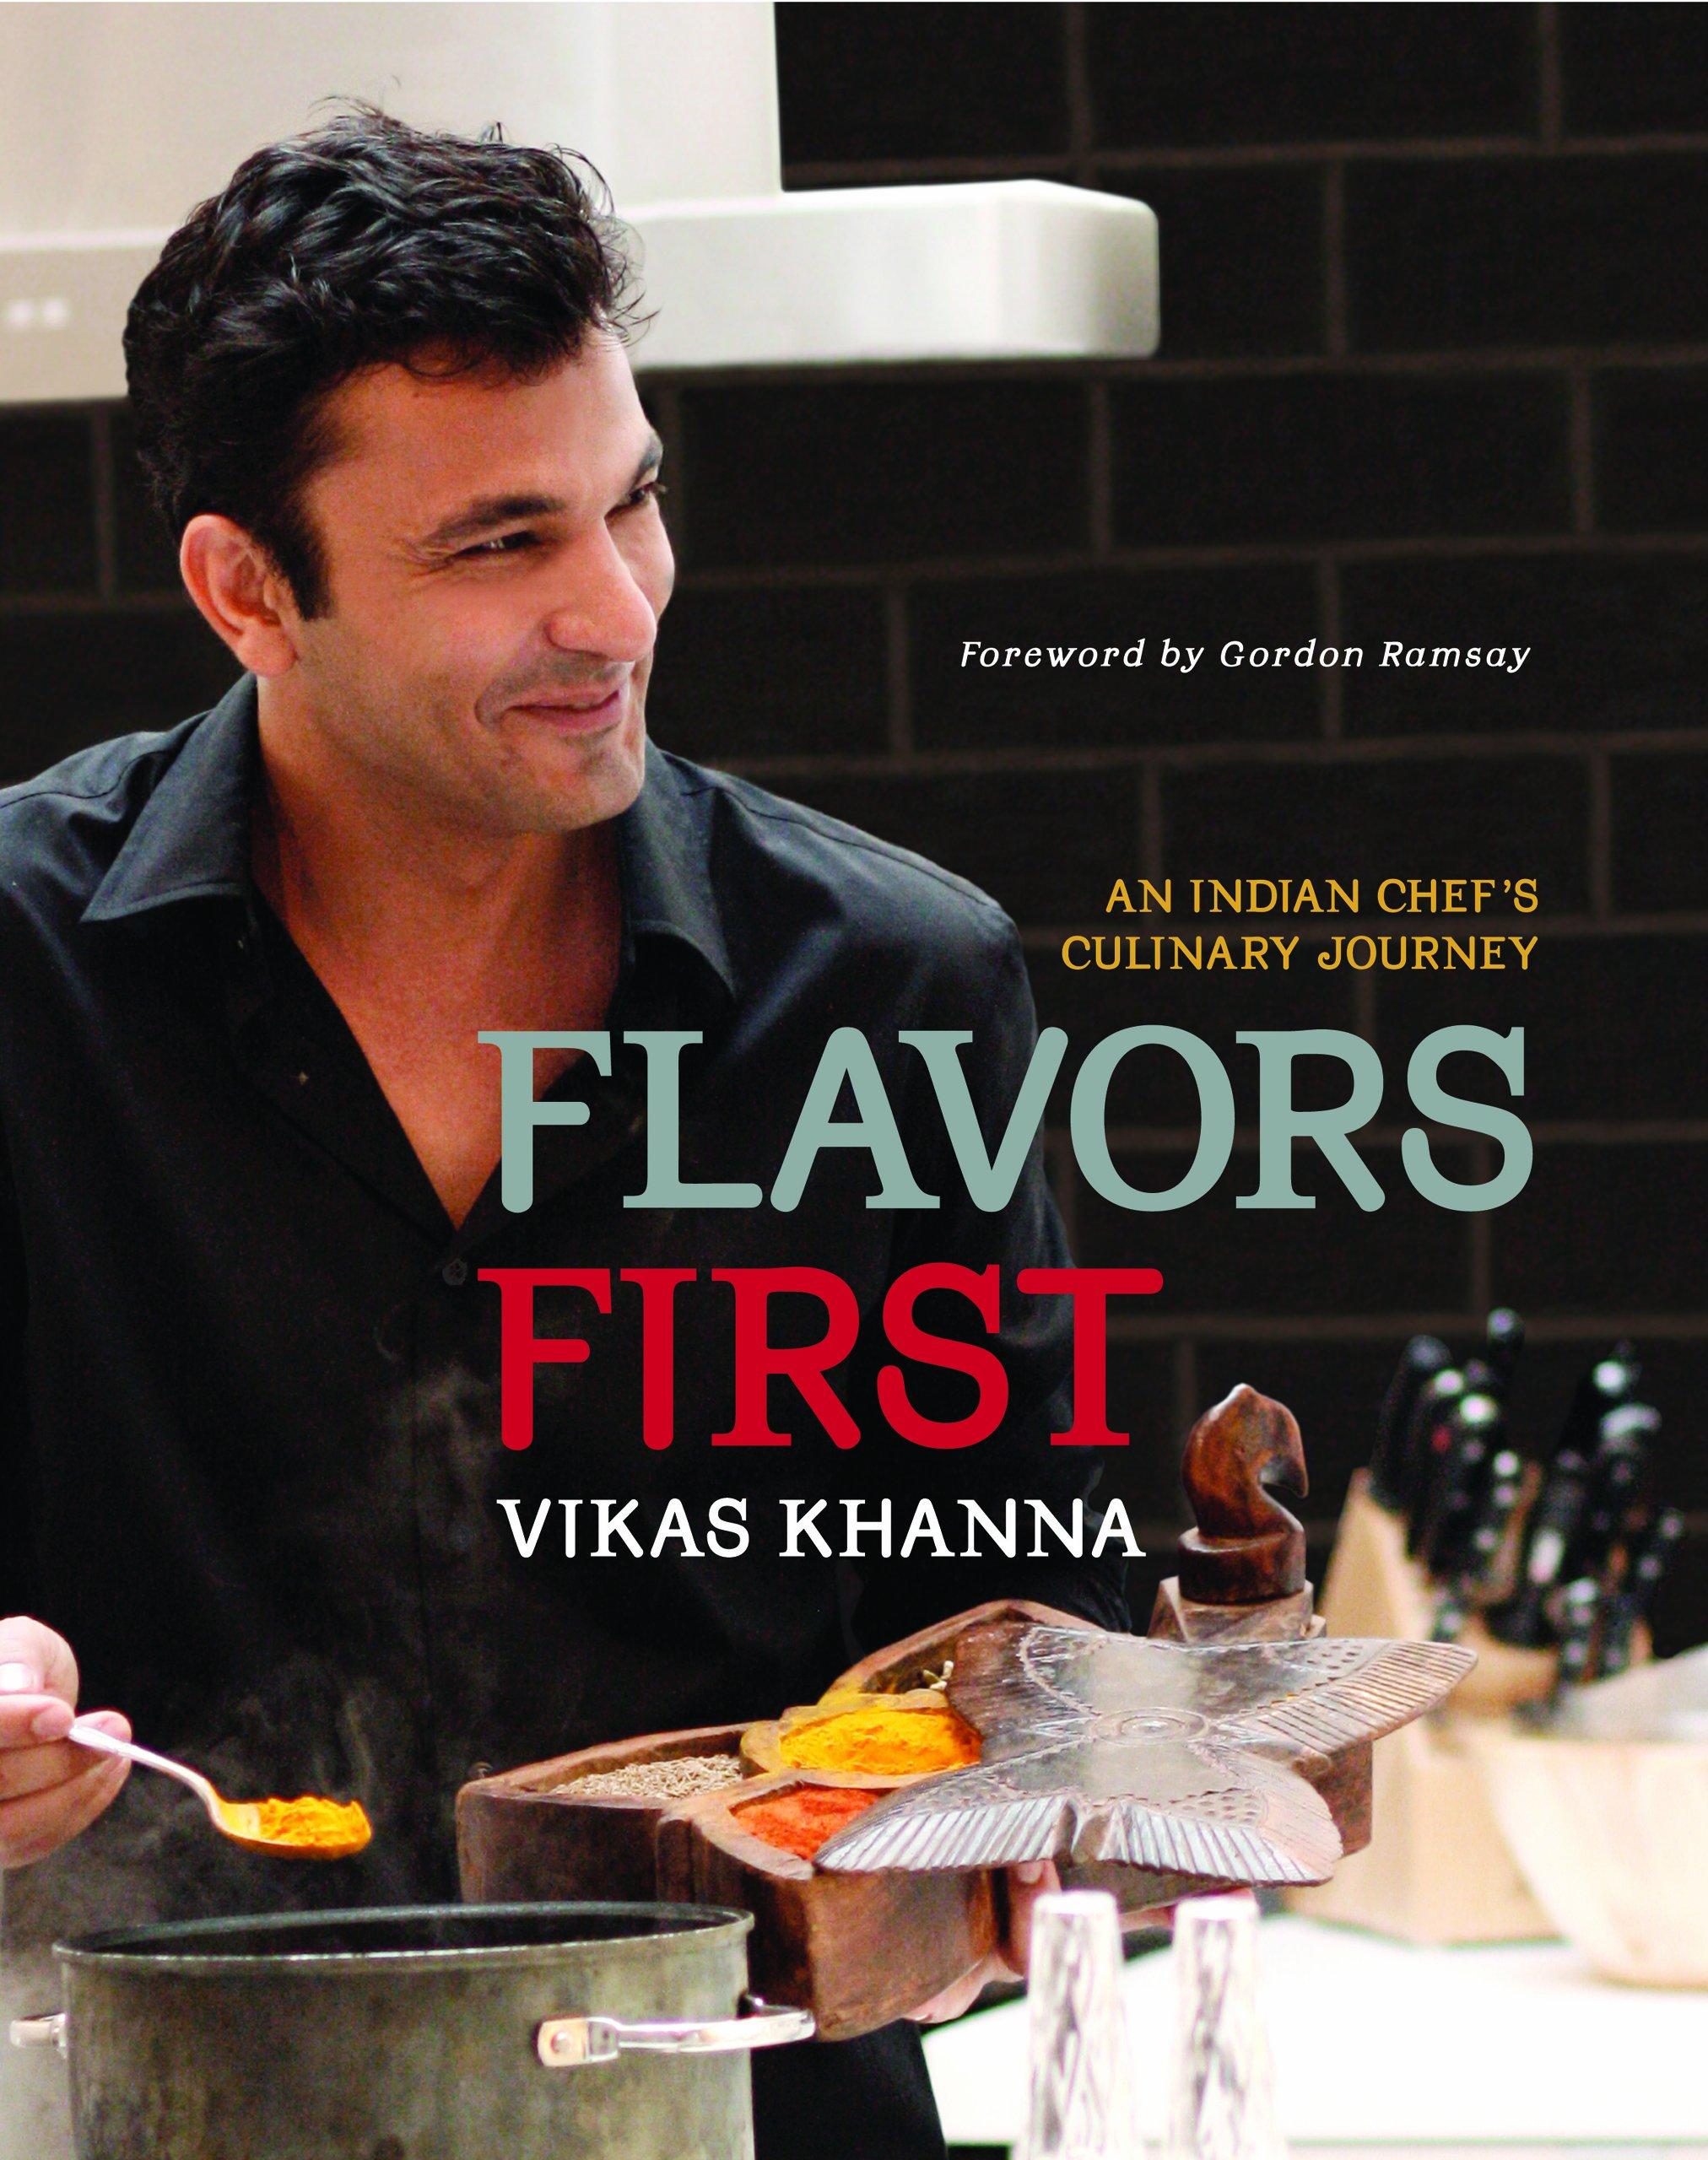 Flavors First An Indian Chef S Culinary Journey Khanna Vikas 9781891105470 Amazon Com Books